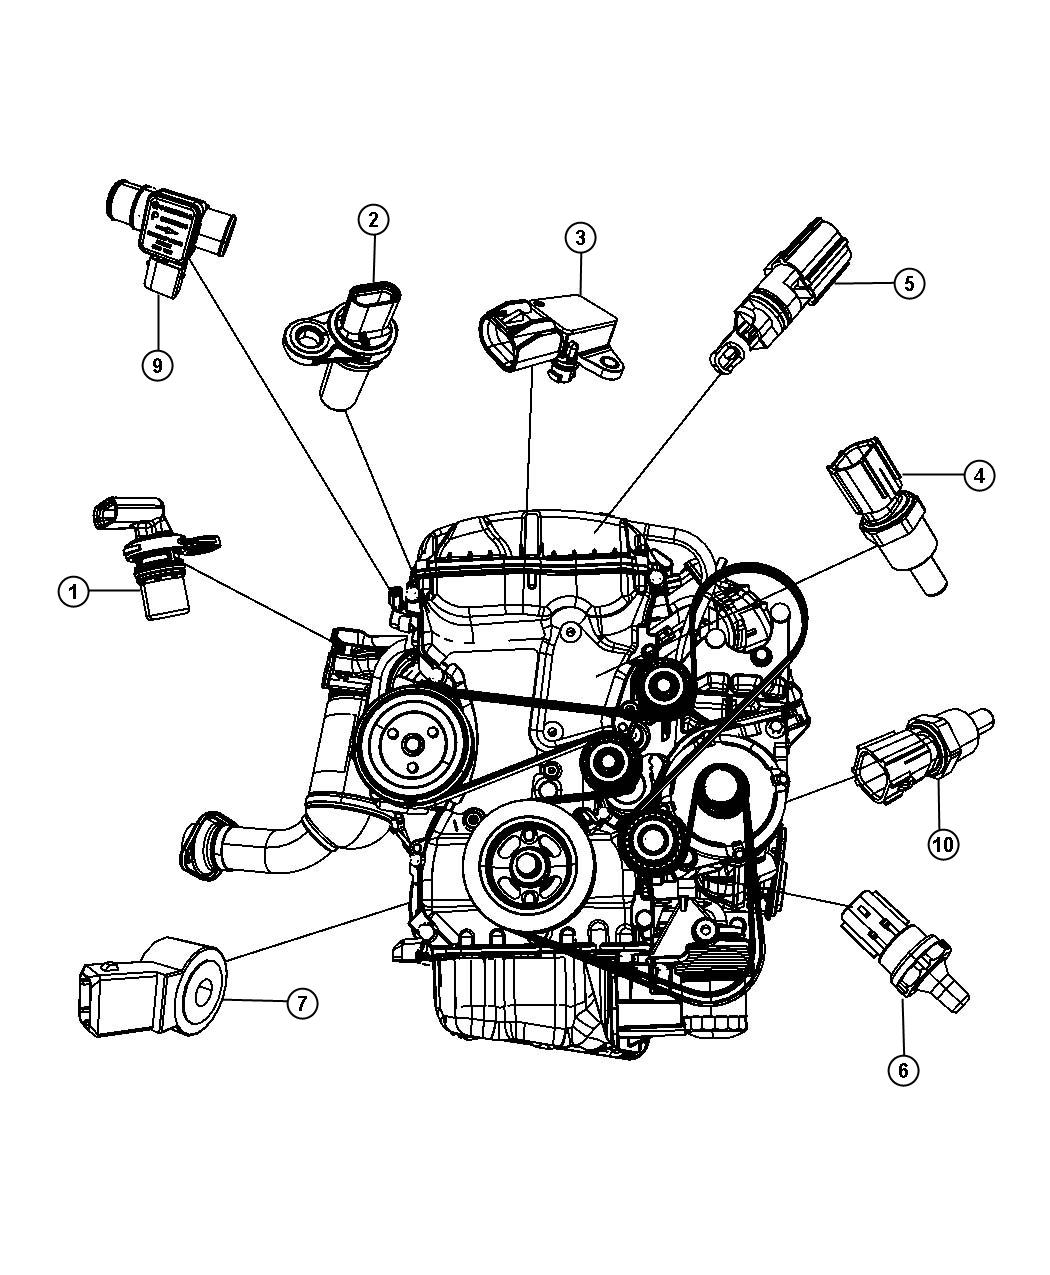 Chrysler 200 Sensor Crankshaft Position Vehicle Speed